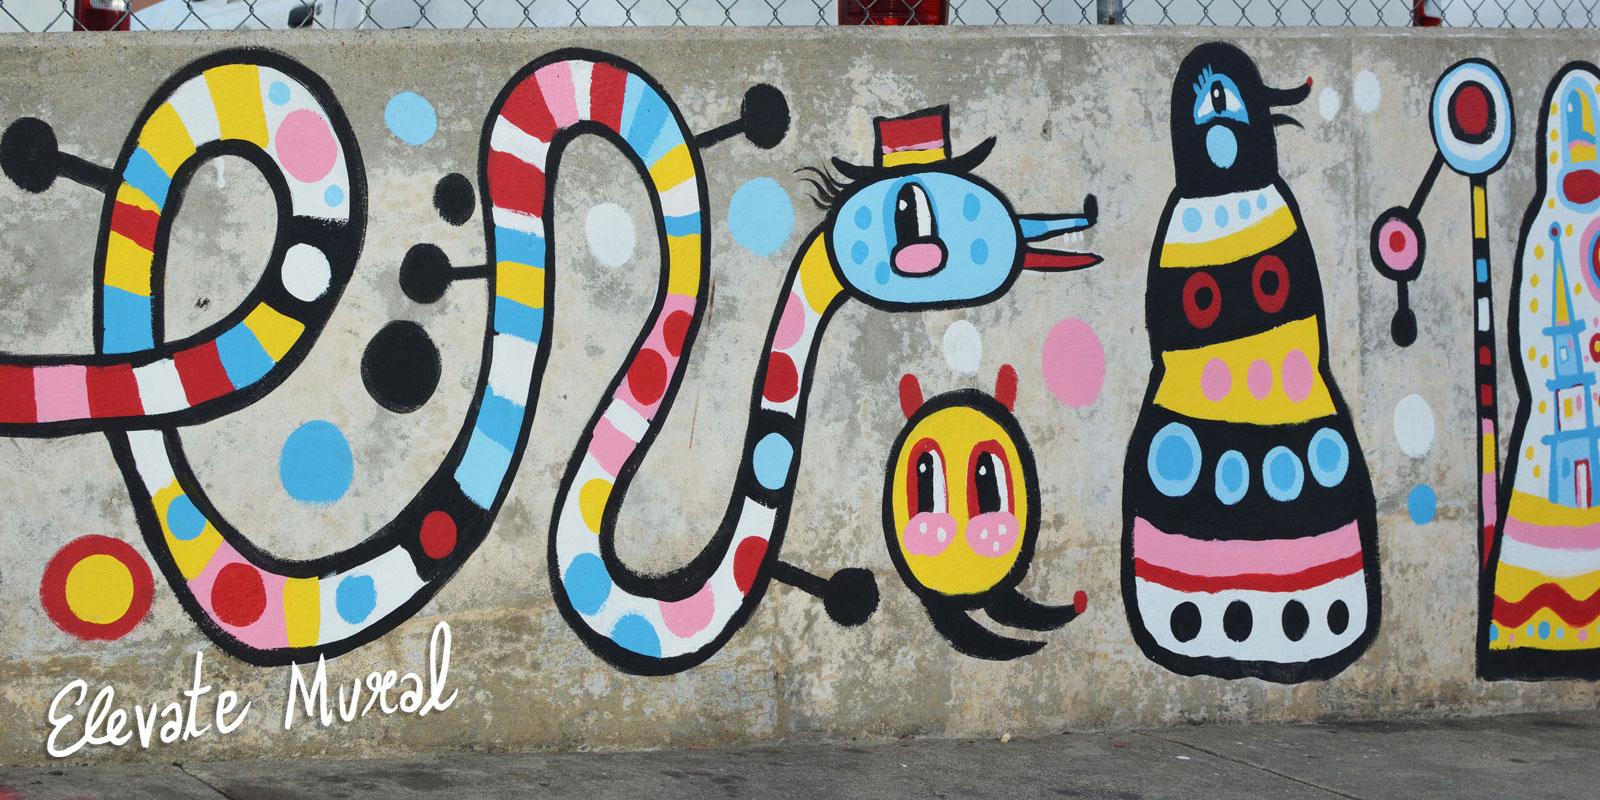 Elevate Mural